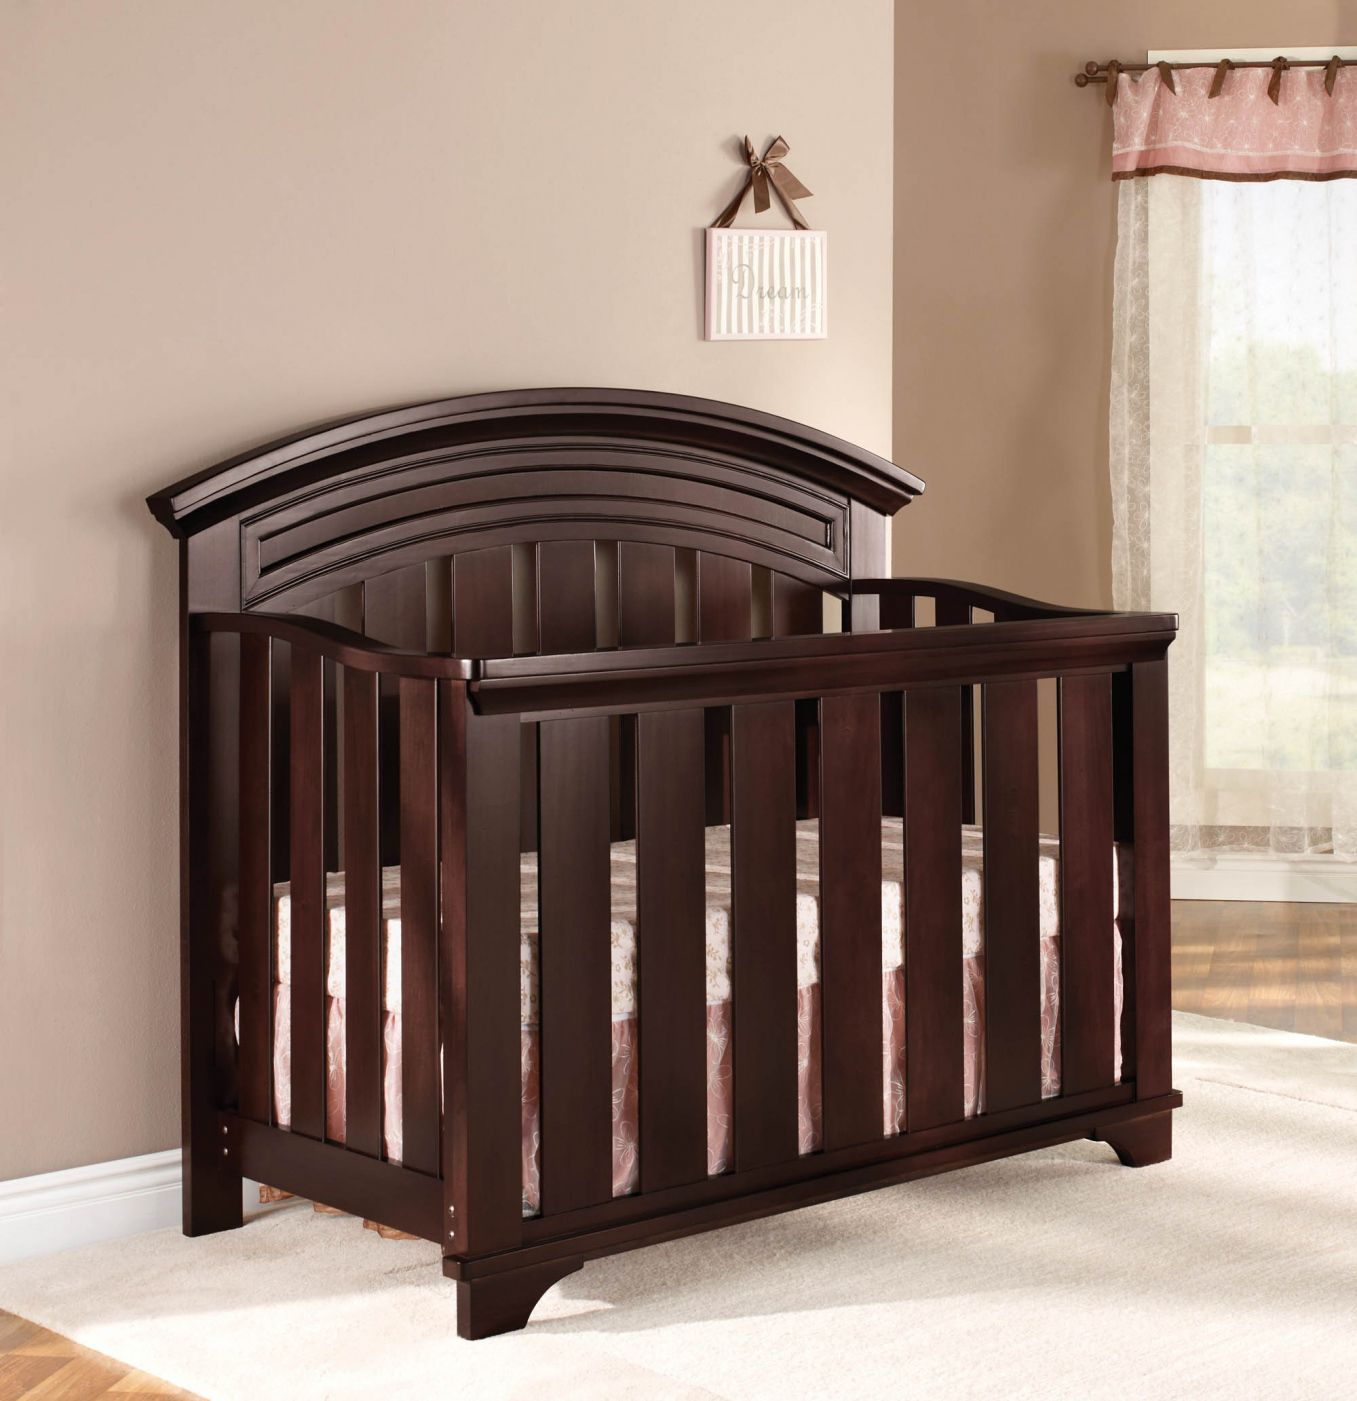 30 Westwood Design Baby Furniture Bedroom Interior